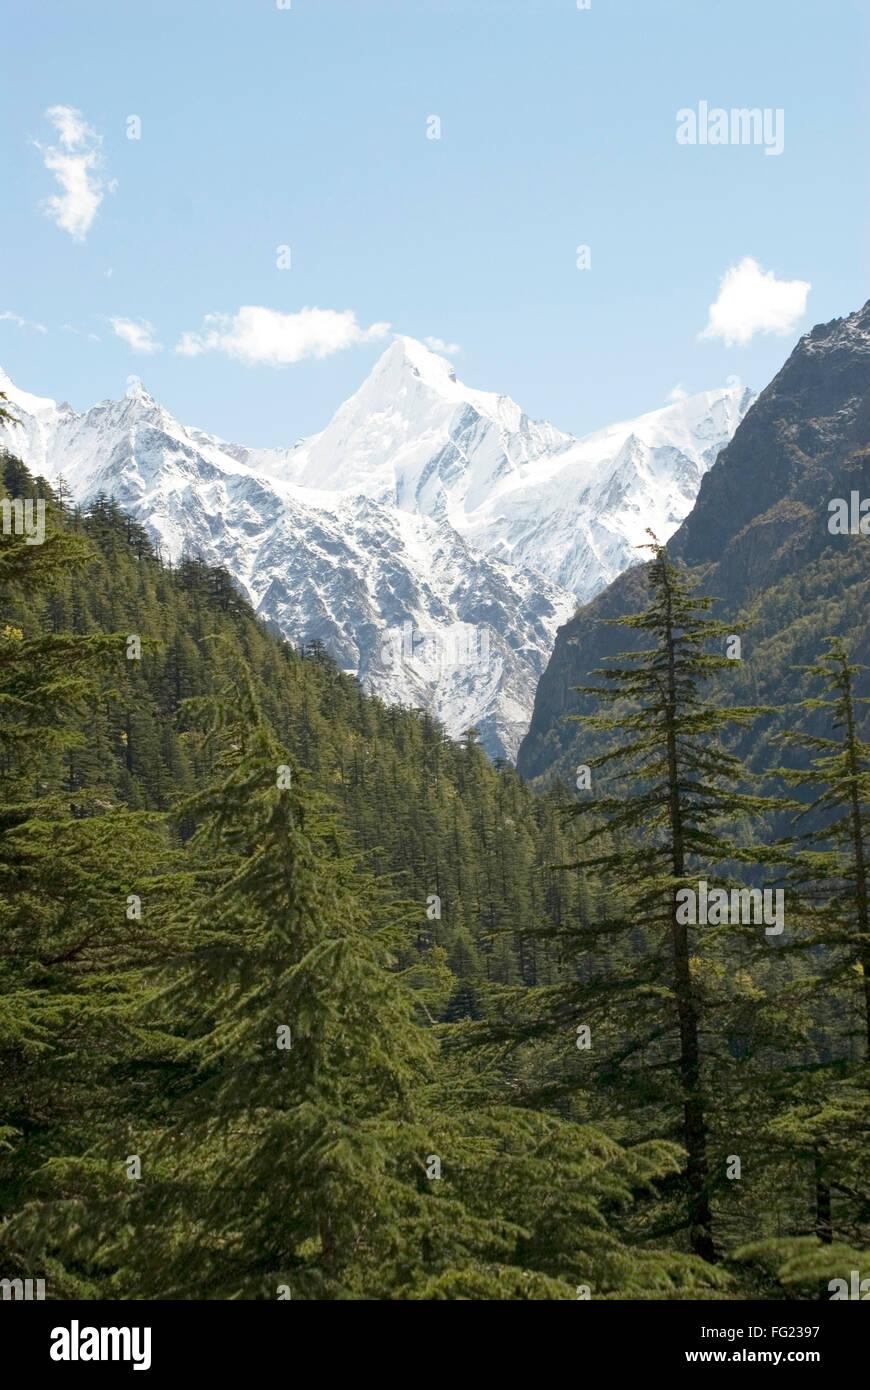 Gangotri national park at Gangotri and Himalayan snow on mountain peak of Sudarshan , Gangotri , Uttaranchal , India - Stock Image